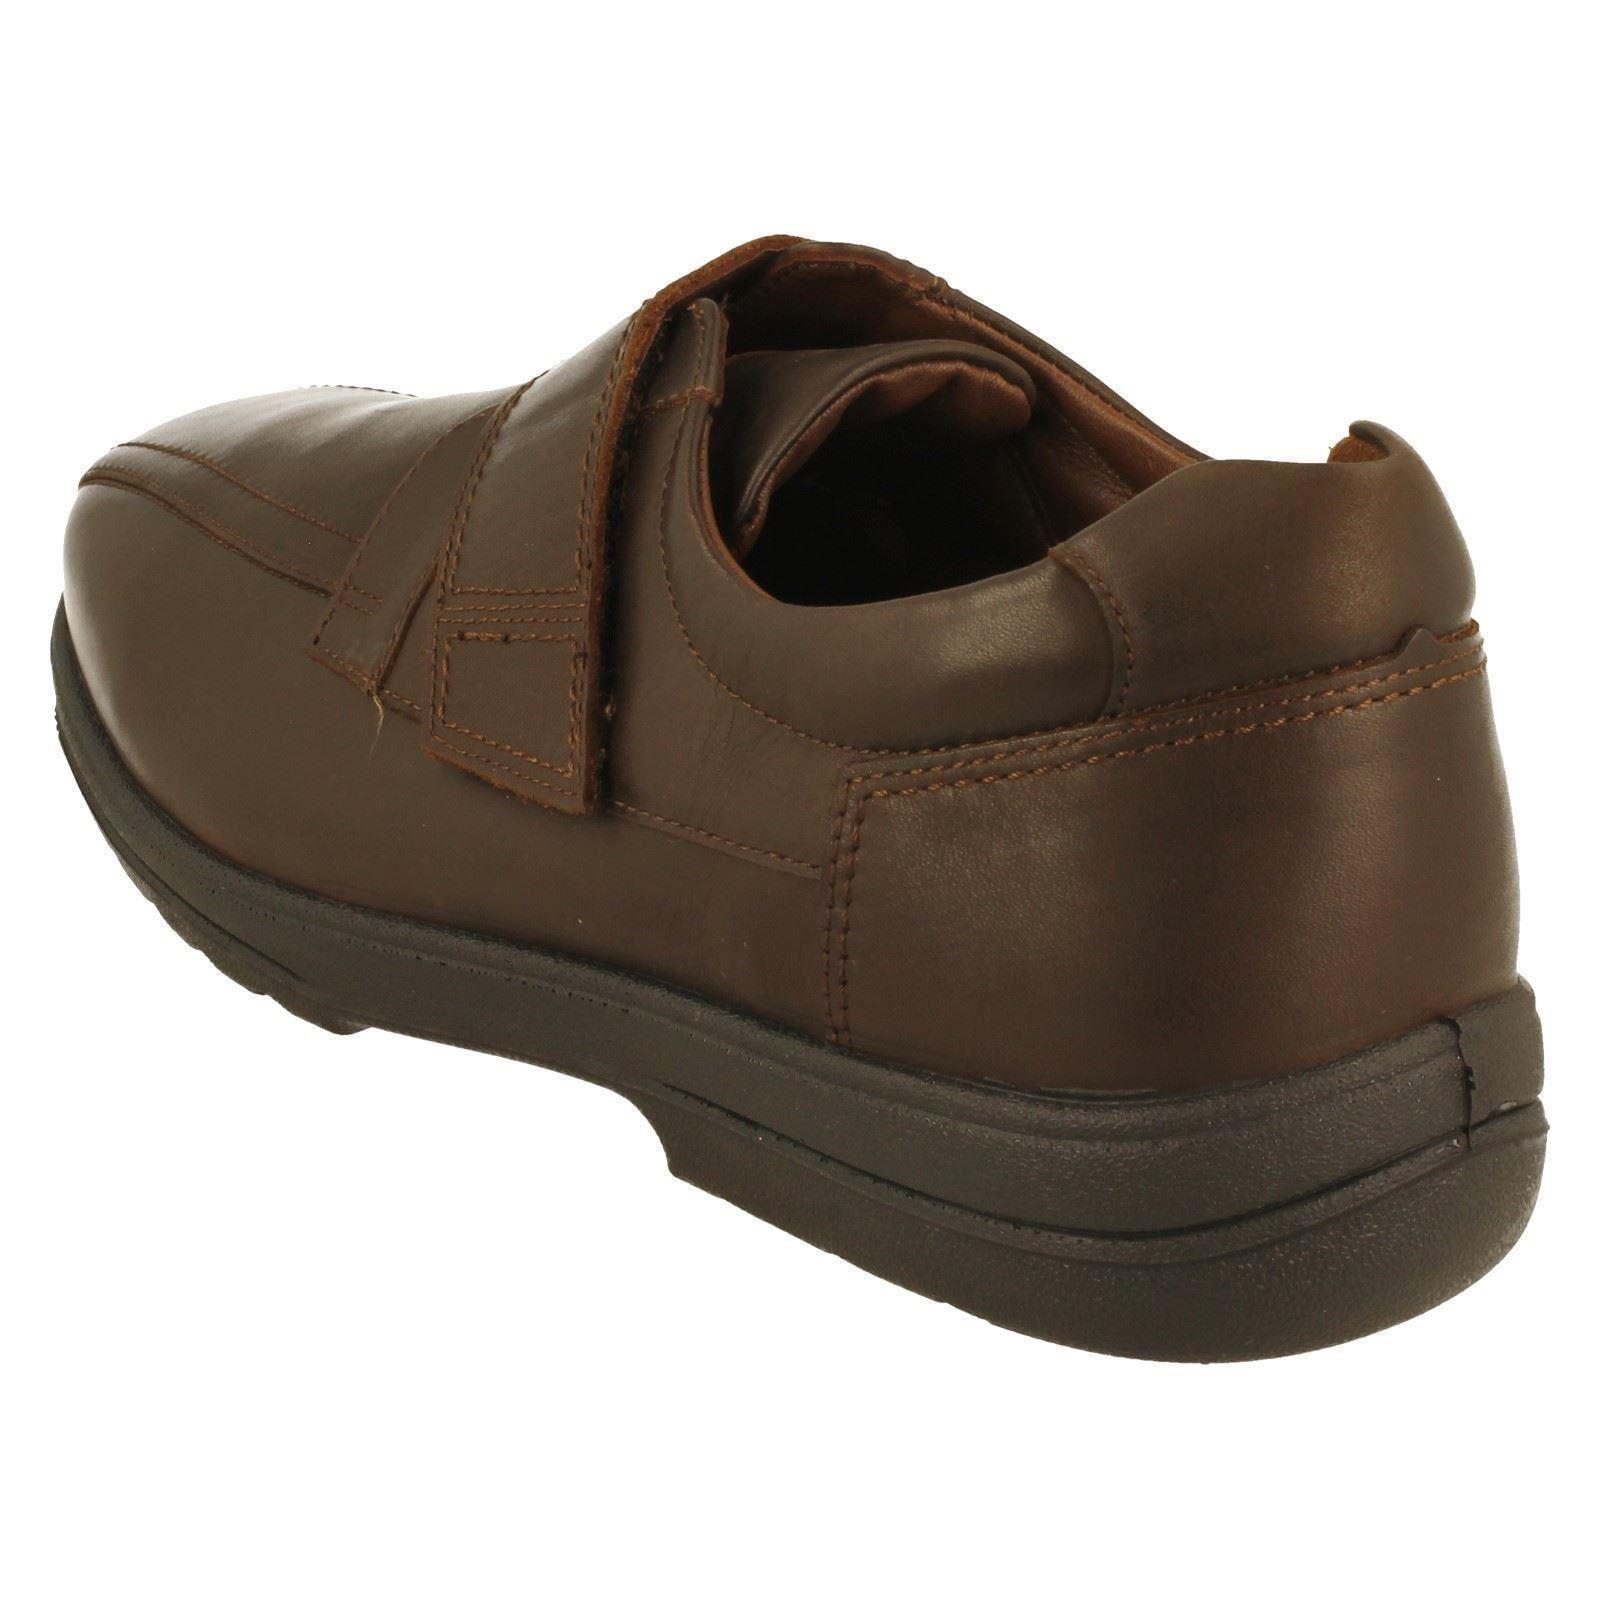 Hombre Padders Zapatos Zapatos Zapatos Daniel Dual Fit-W c59298